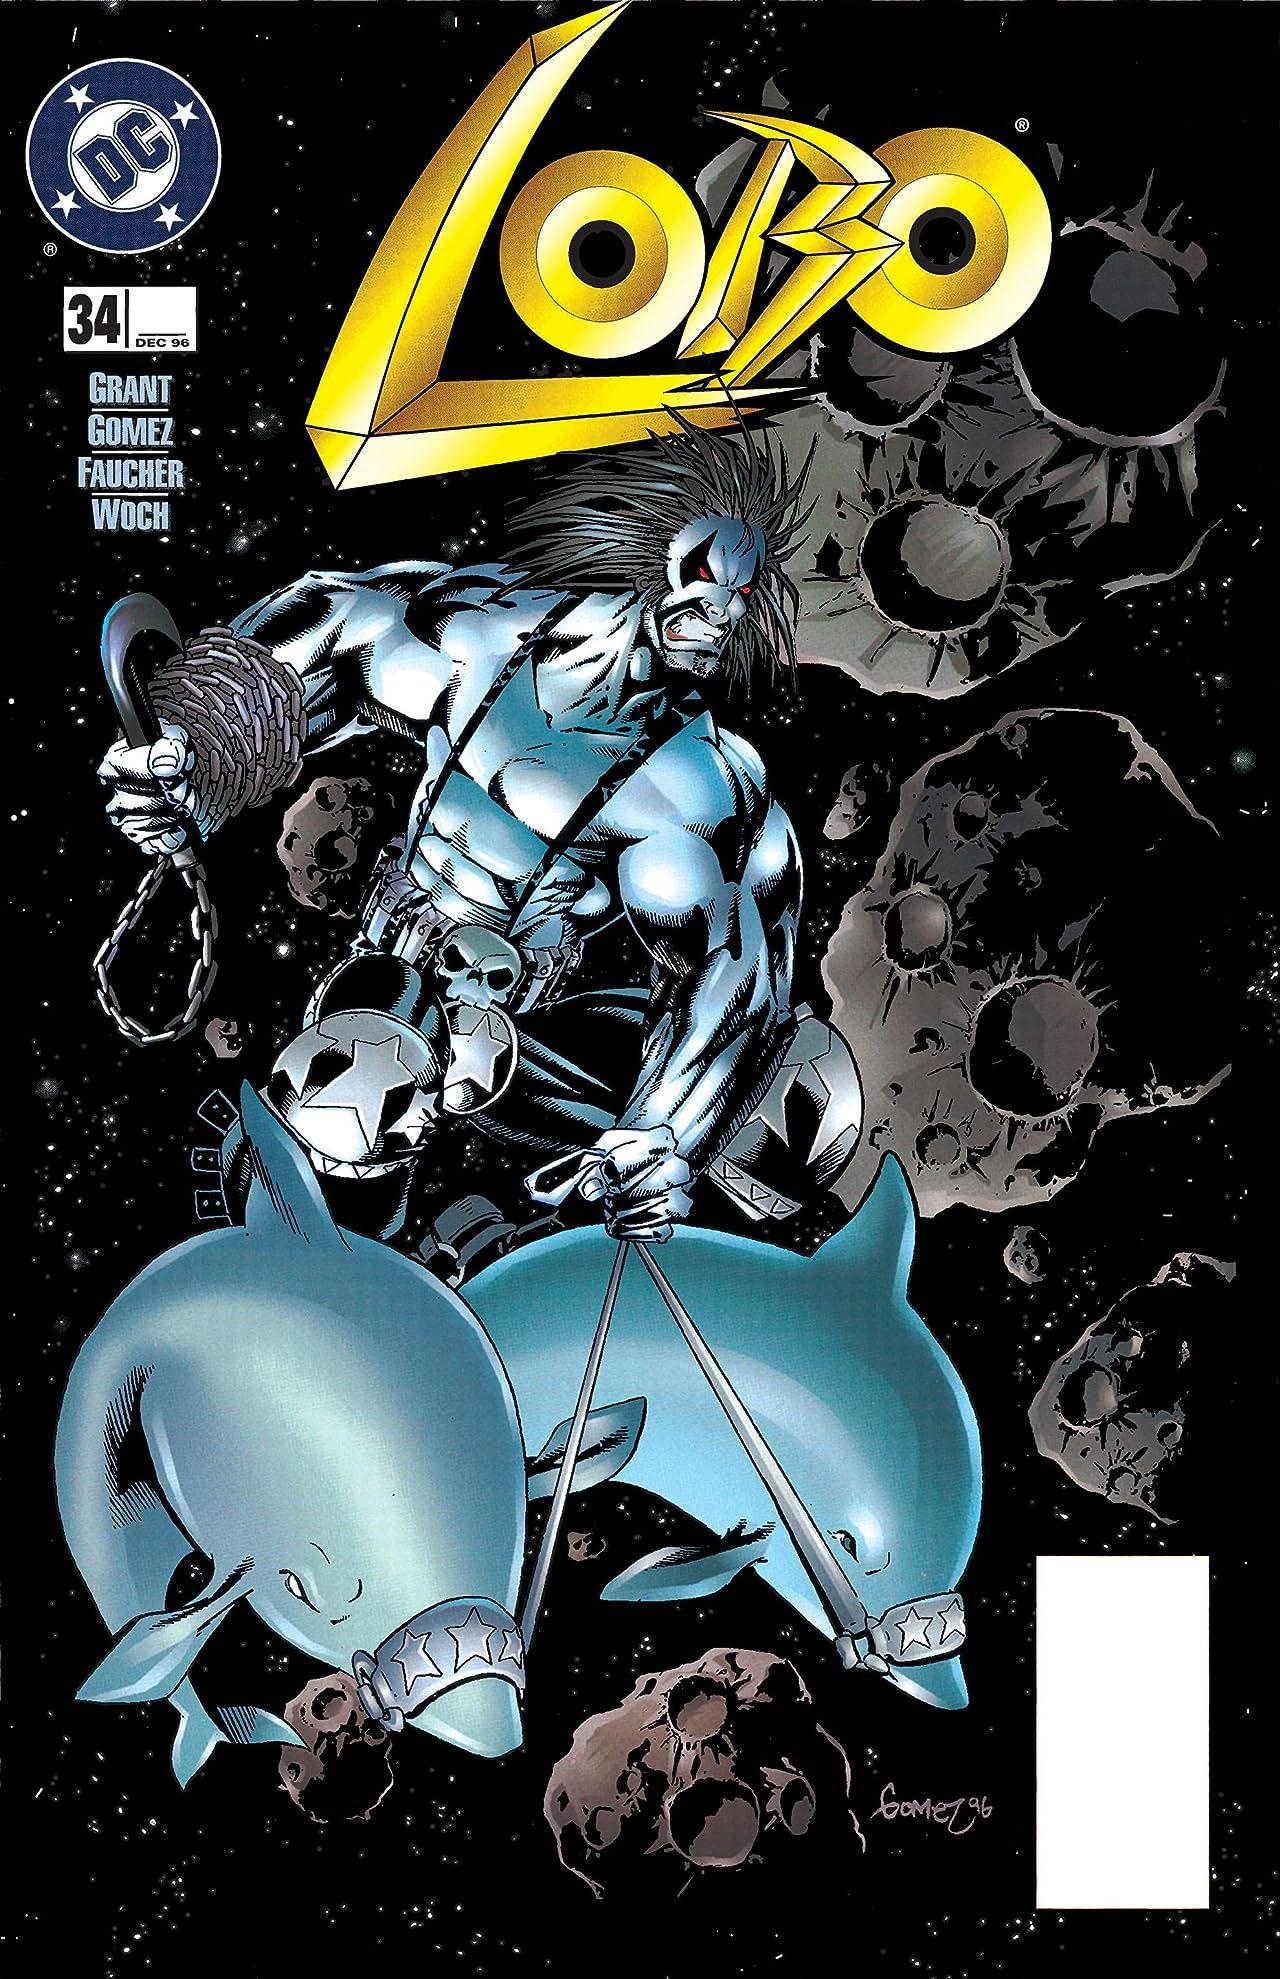 Lobo (1993-1999) #34